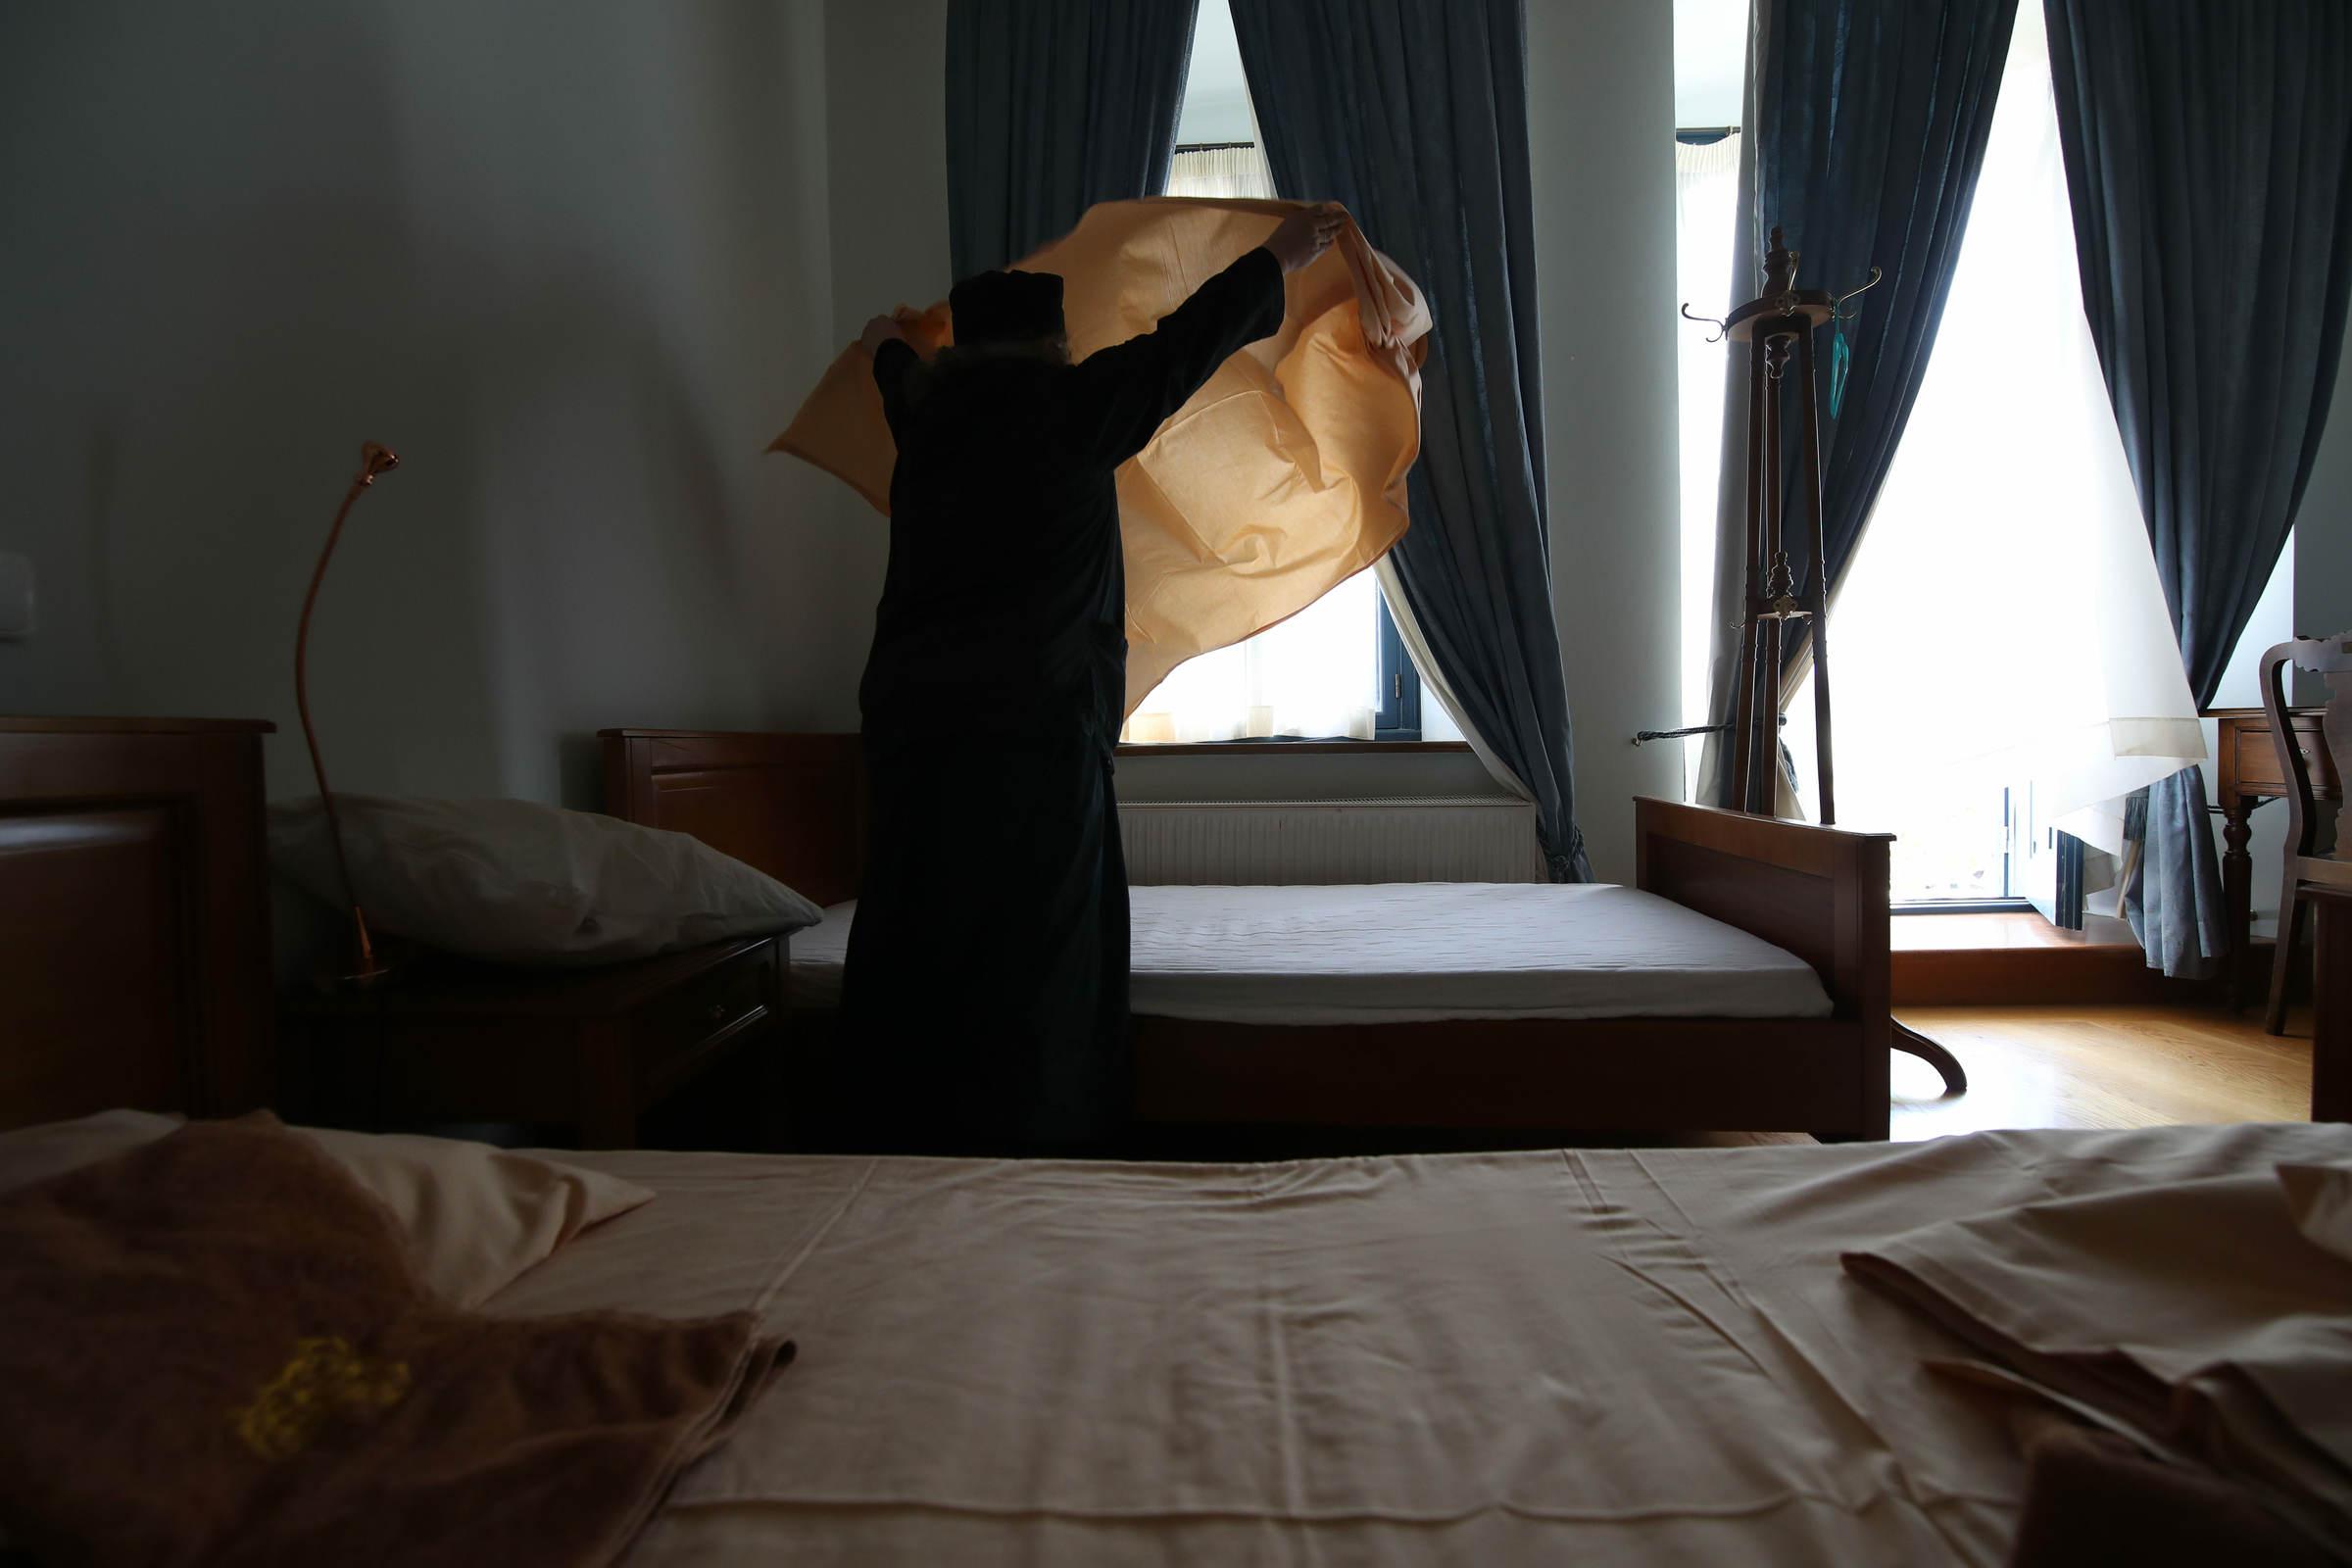 Cel mai mare doctor din China - (C) Vatopedi monastery, Mount Athos